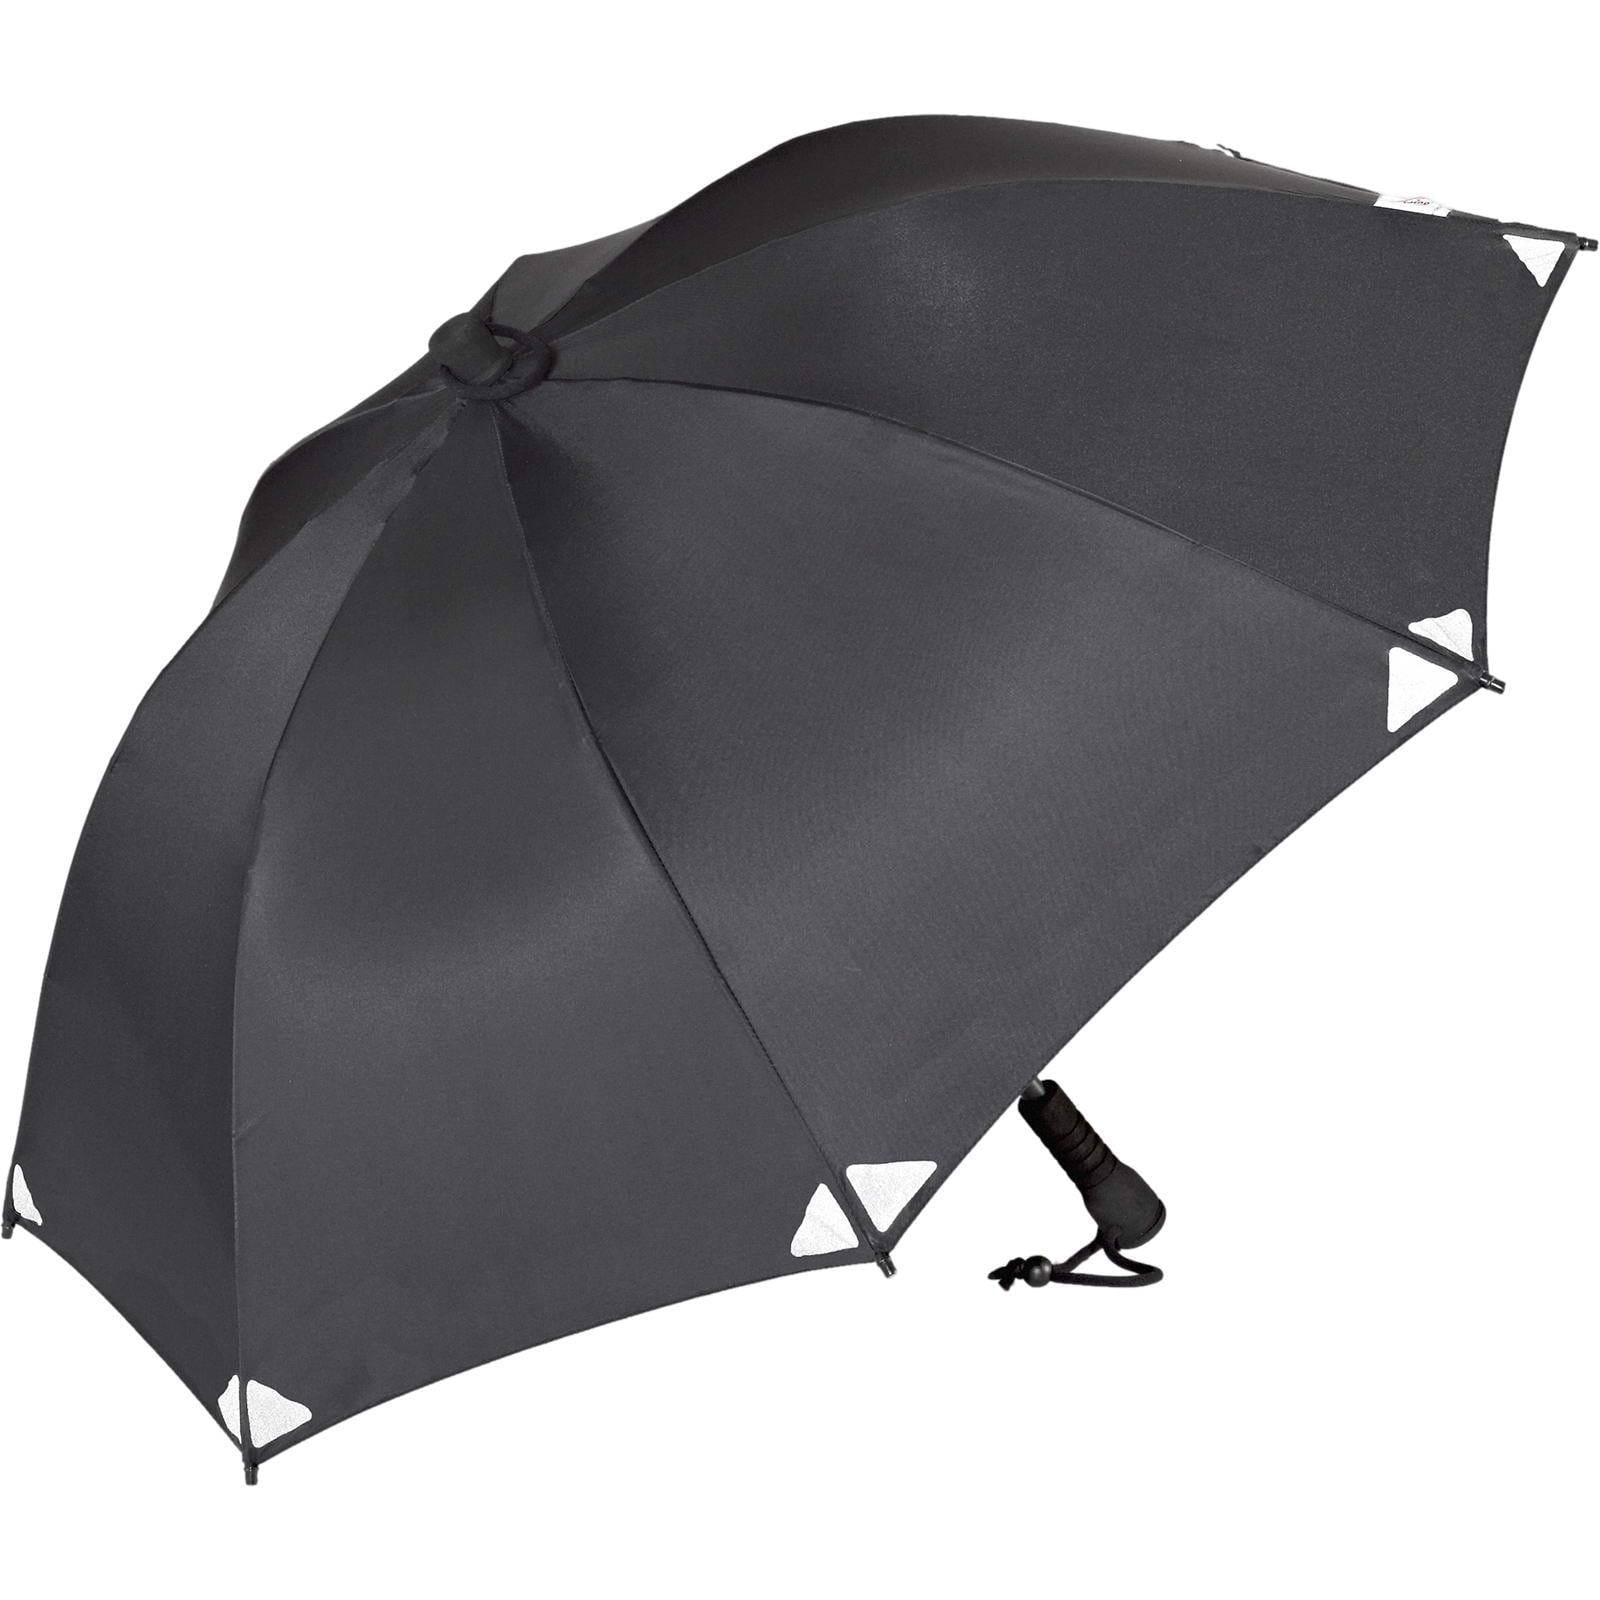 EuroSchirm Swing liteflex - Regenschirm reflective